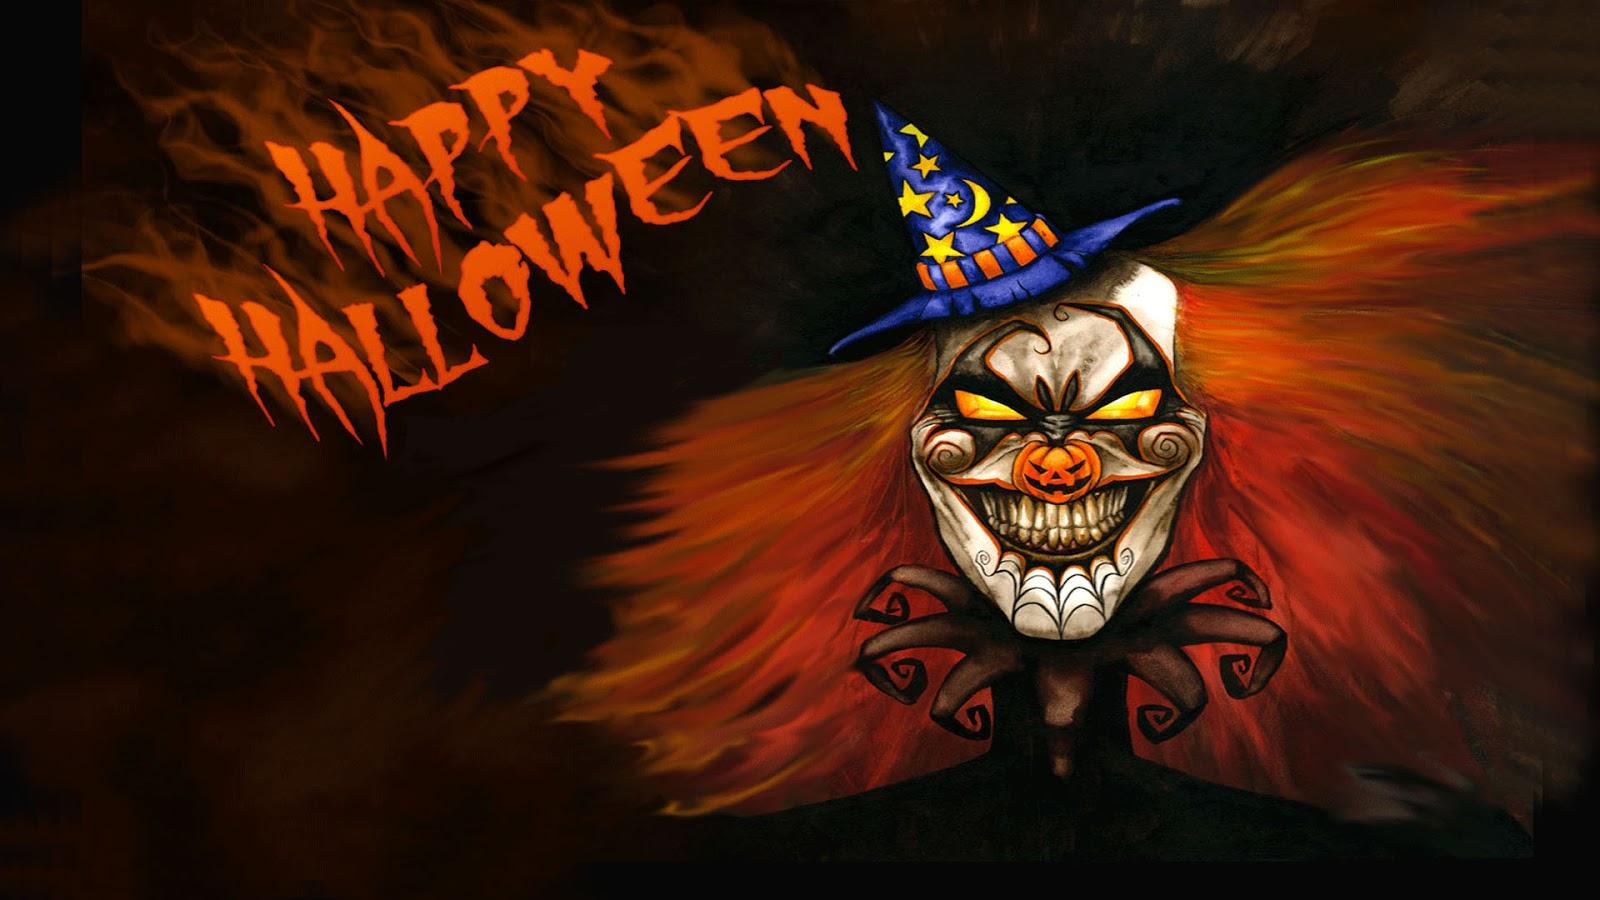 HD}} Halloween Wallpaper, Cute Halloween Wallpapers,Free Halloween ...